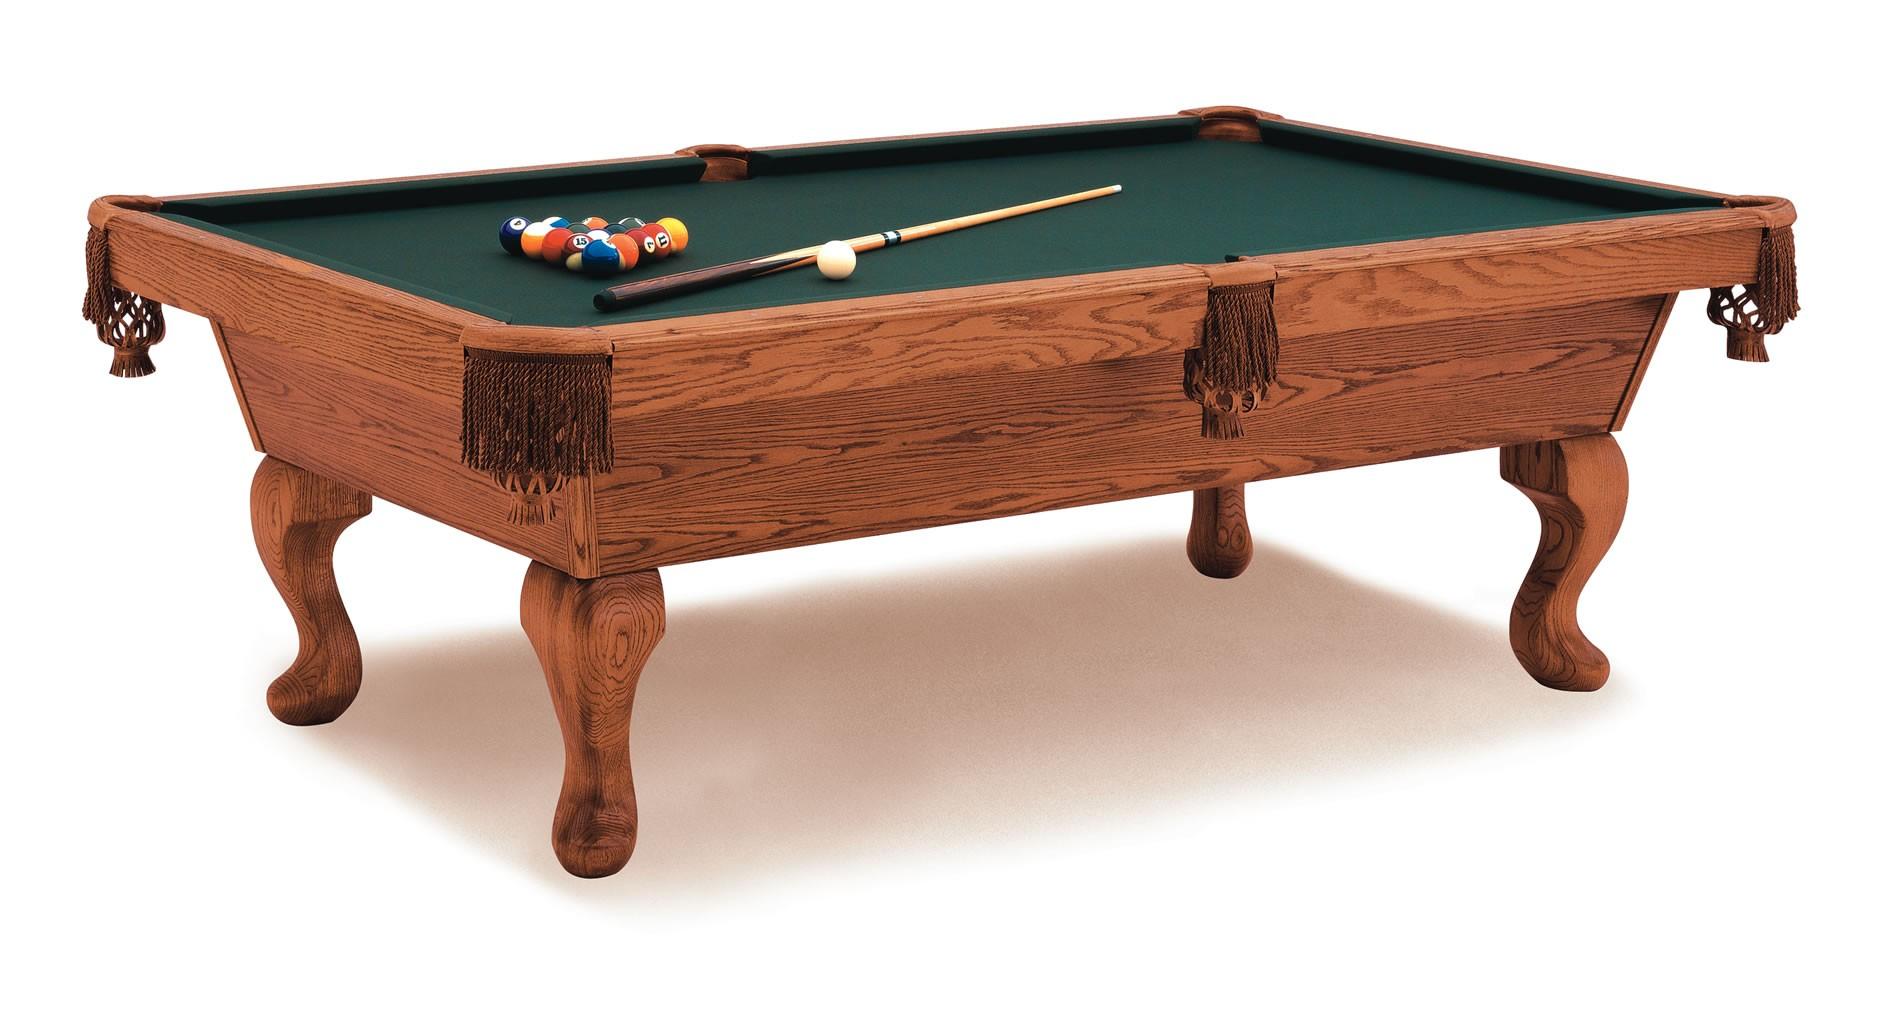 Olhausen Pool Tables Absolute Billiard Services - Pool table breakdown